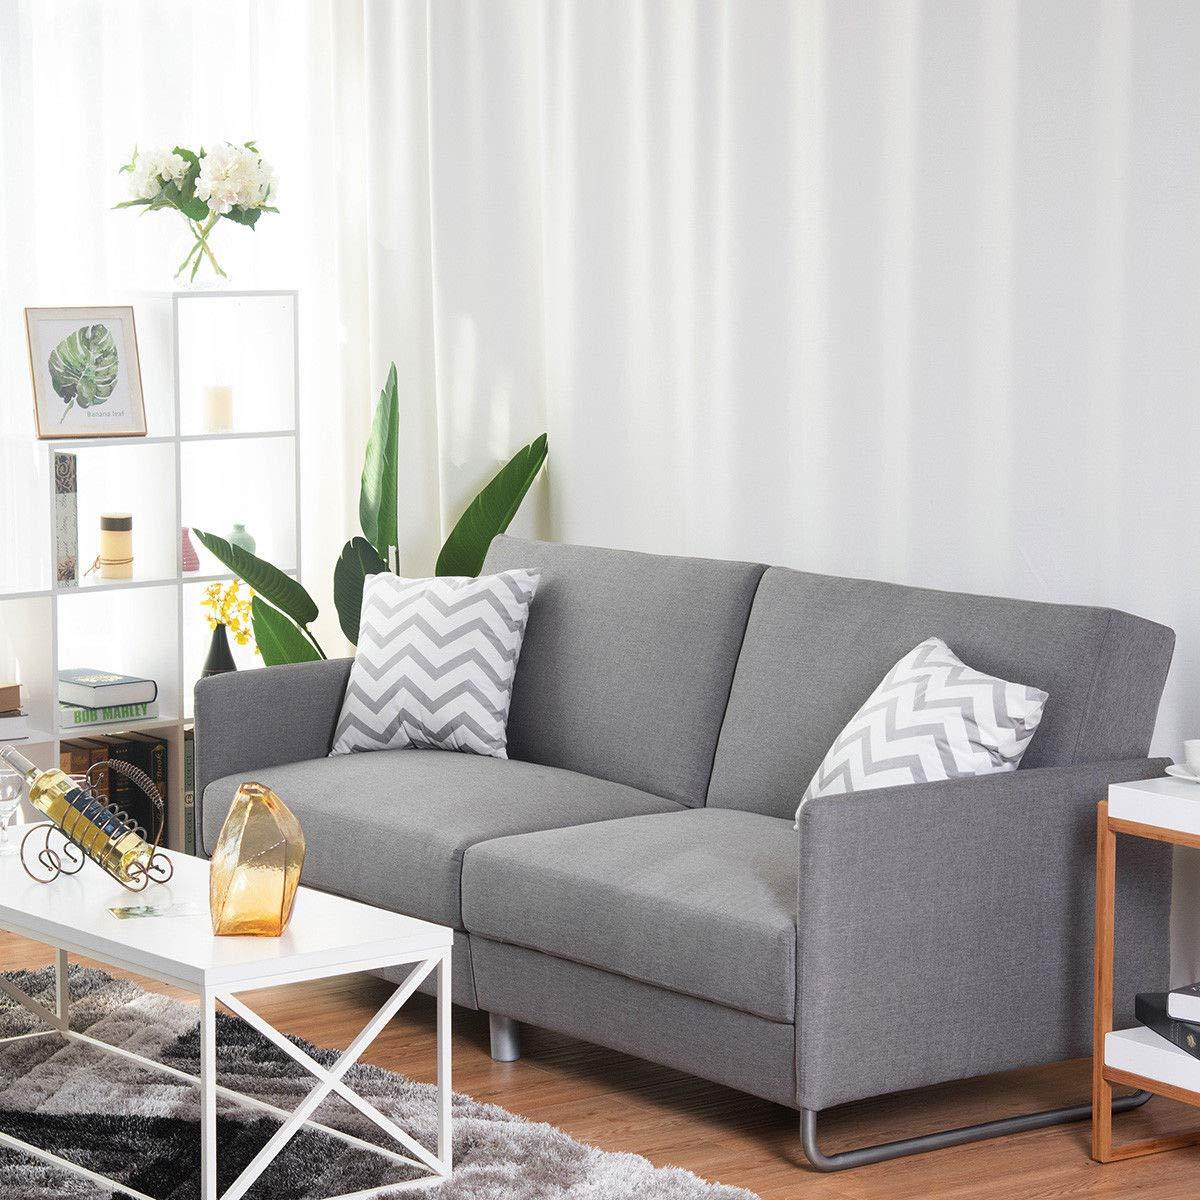 Amazon.com: Modern Futon Sofa Bed Convertible Recliner Couch ...